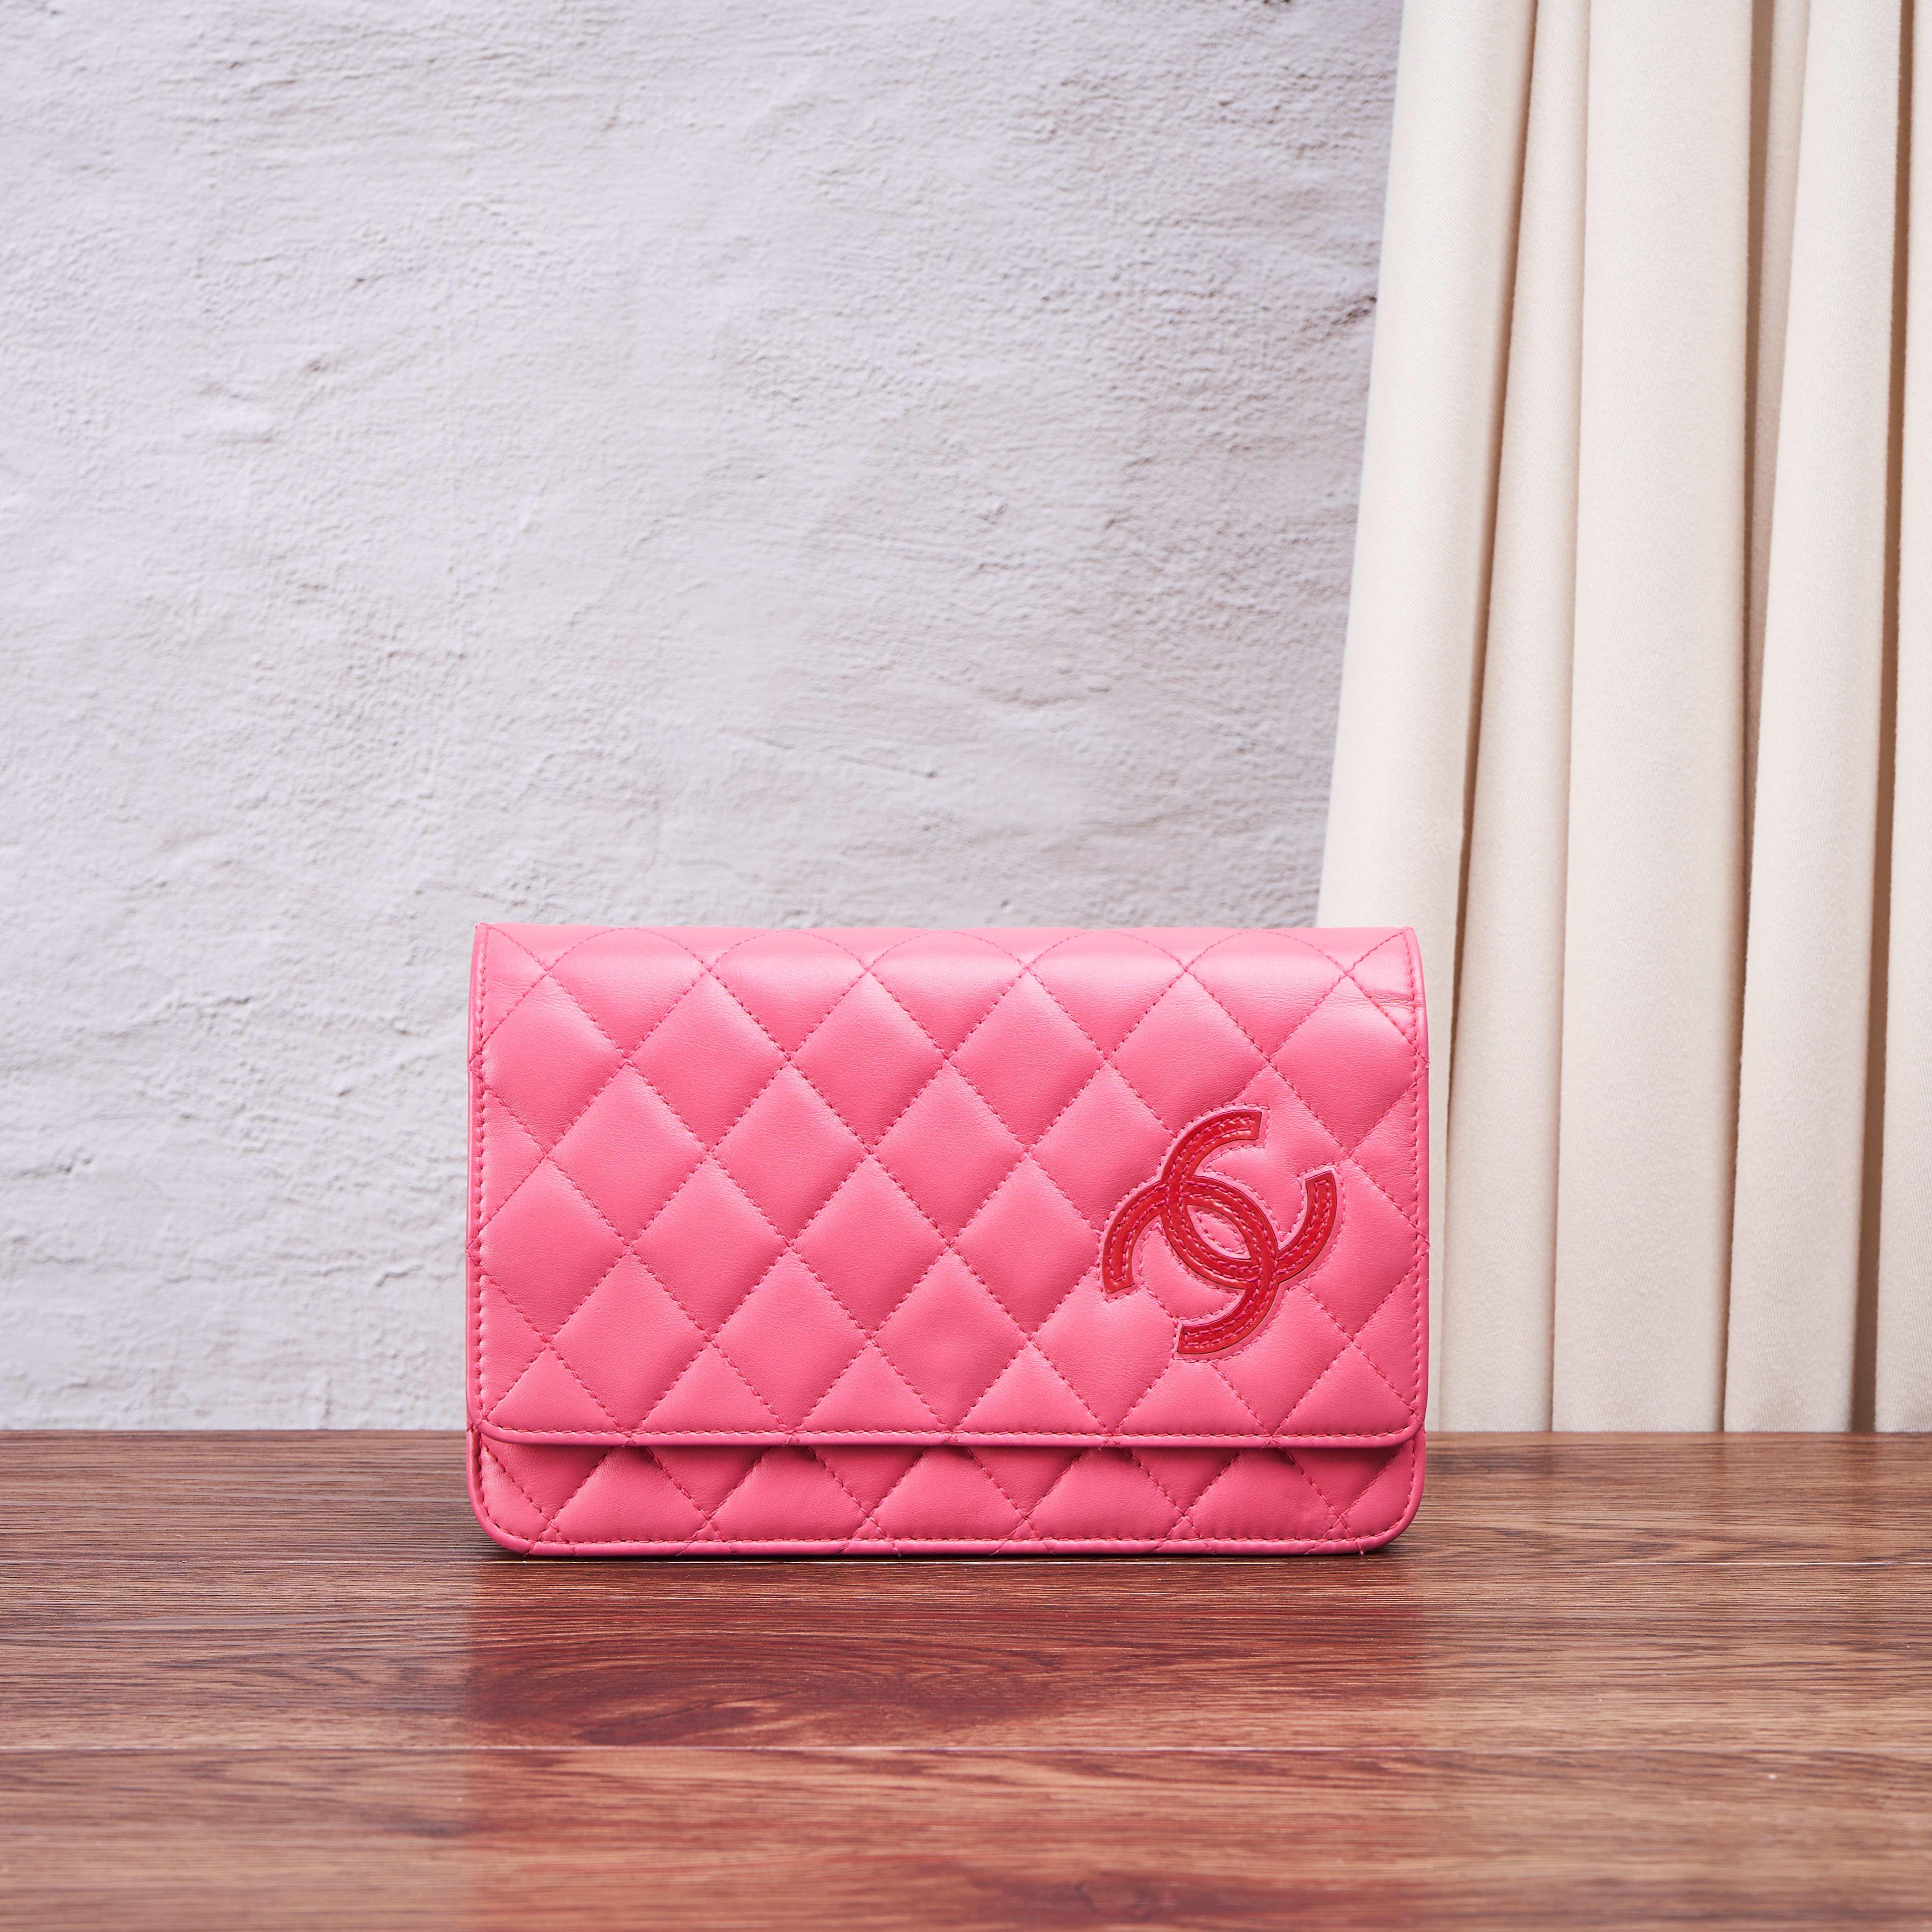 chanel链条包 【95新】Chanel香奈儿 粉色woc链条包 19*12 公价¥16700_推荐淘宝好看的chanel链条包